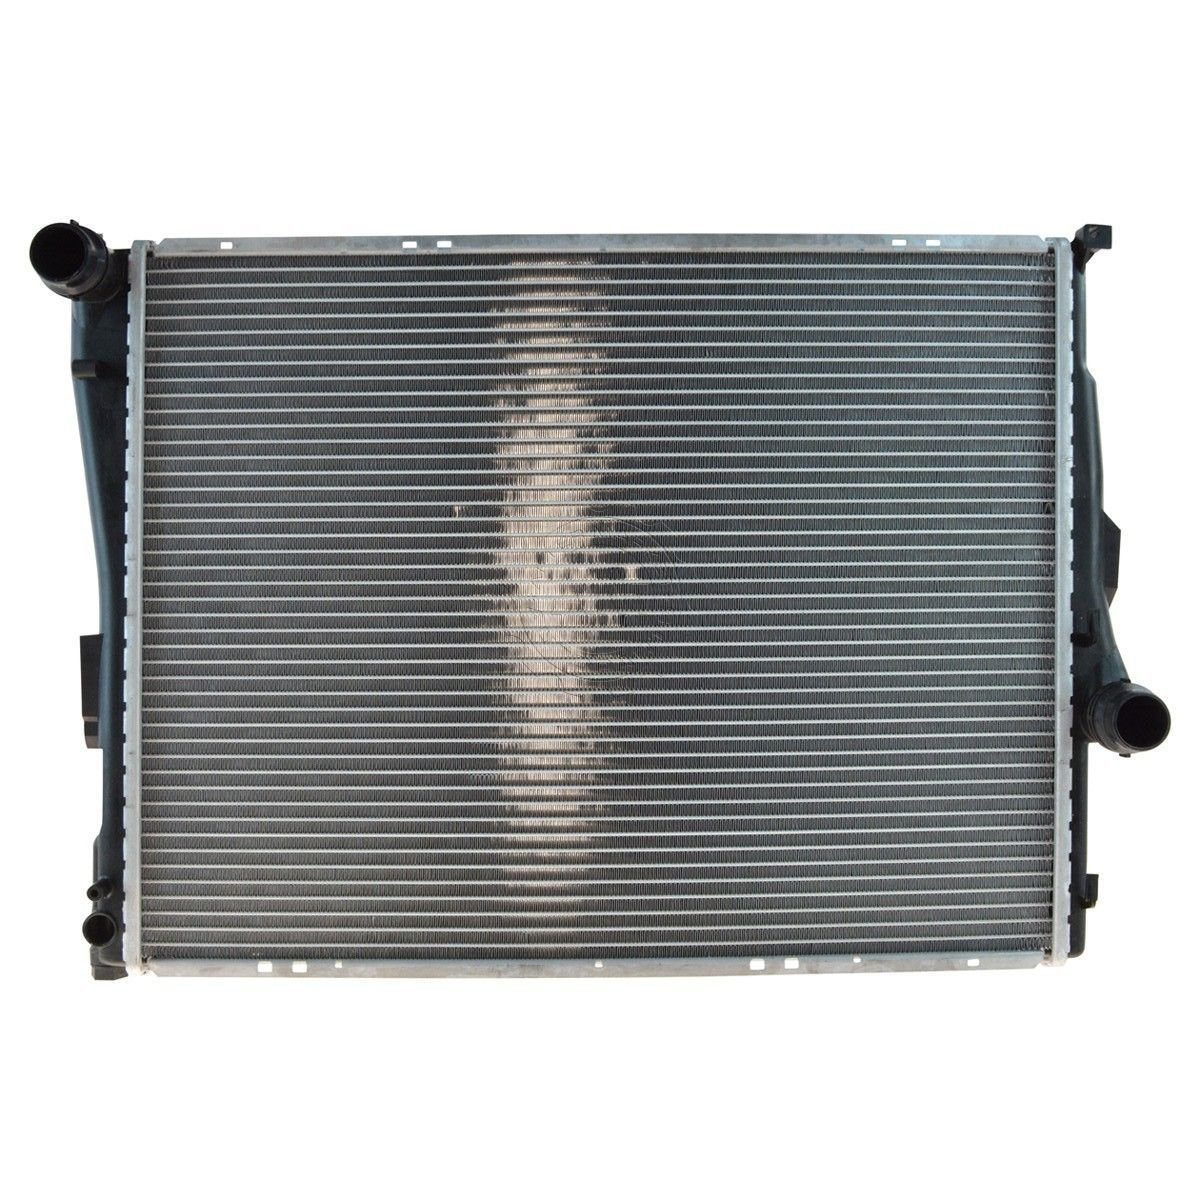 Radiator New For Bmw 3 Series Z4 E46